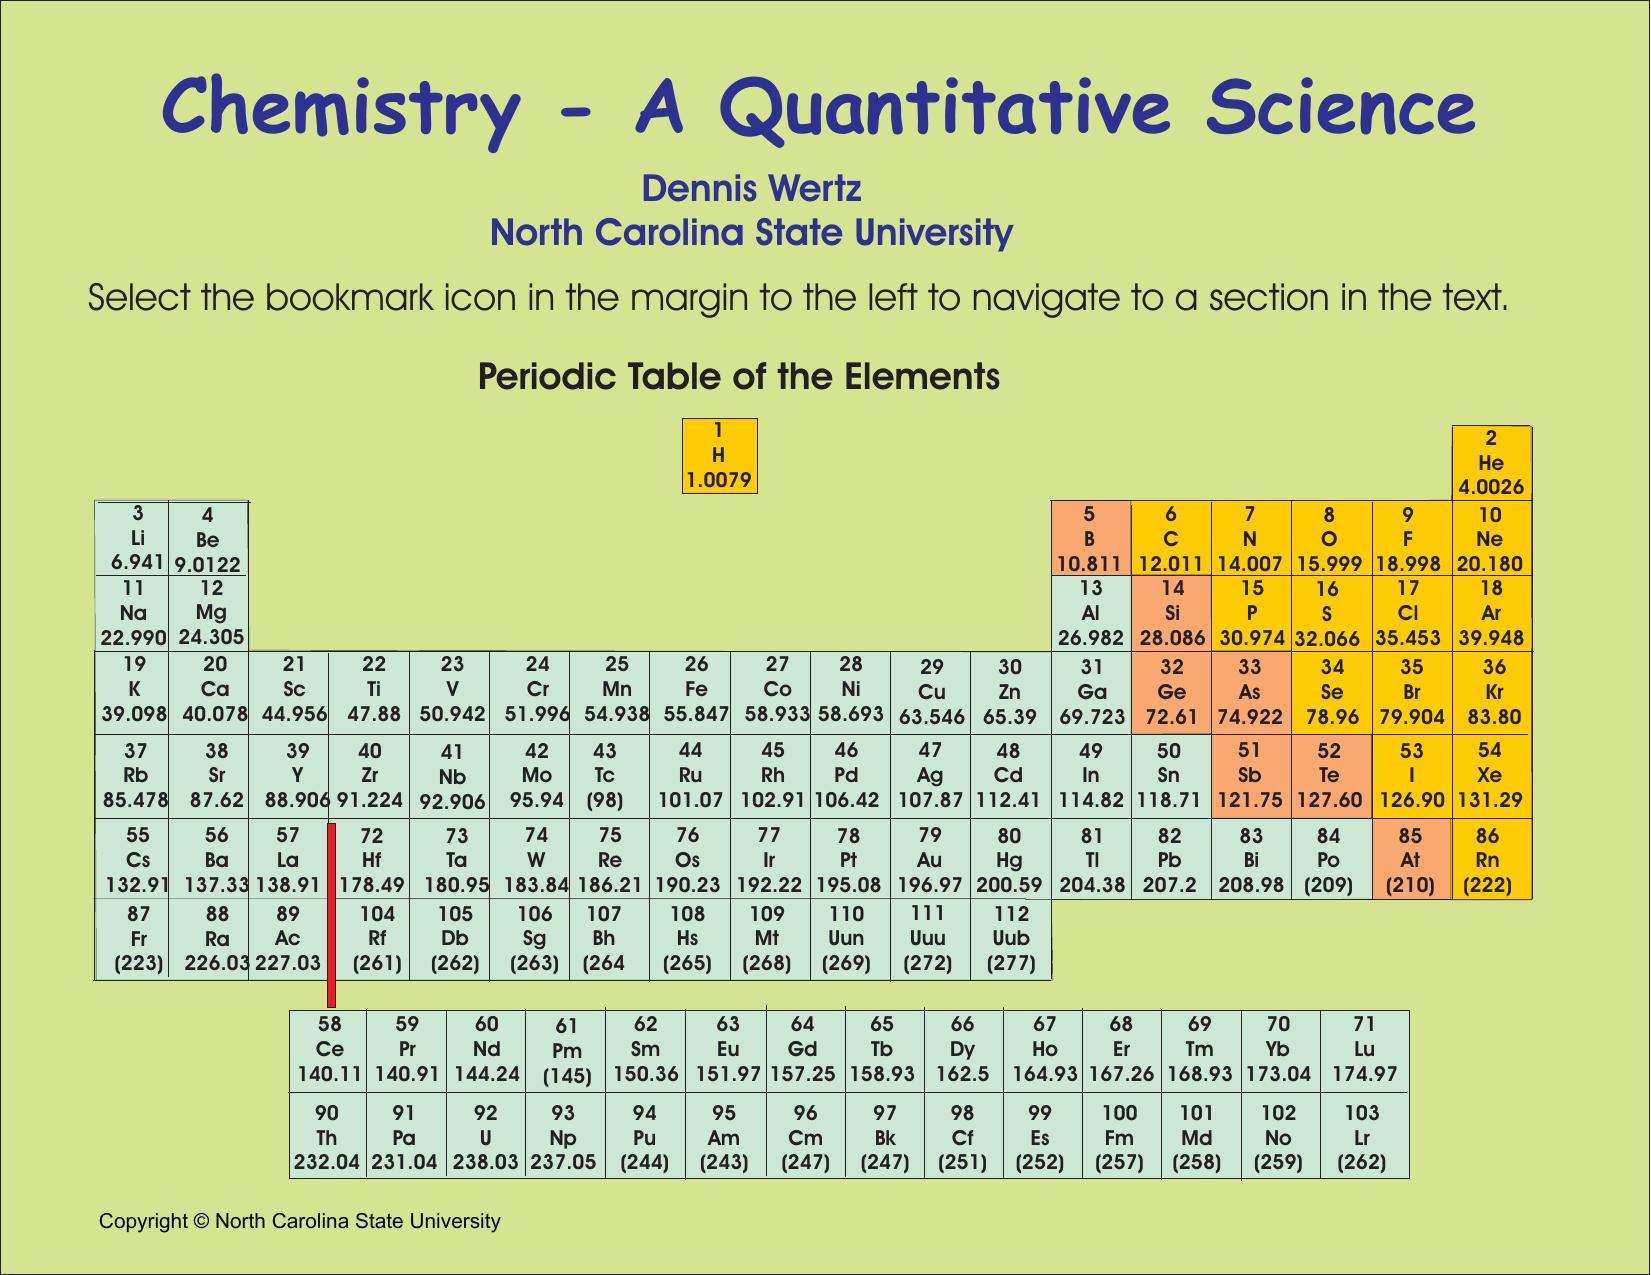 Chemistry - A Quantitative Science